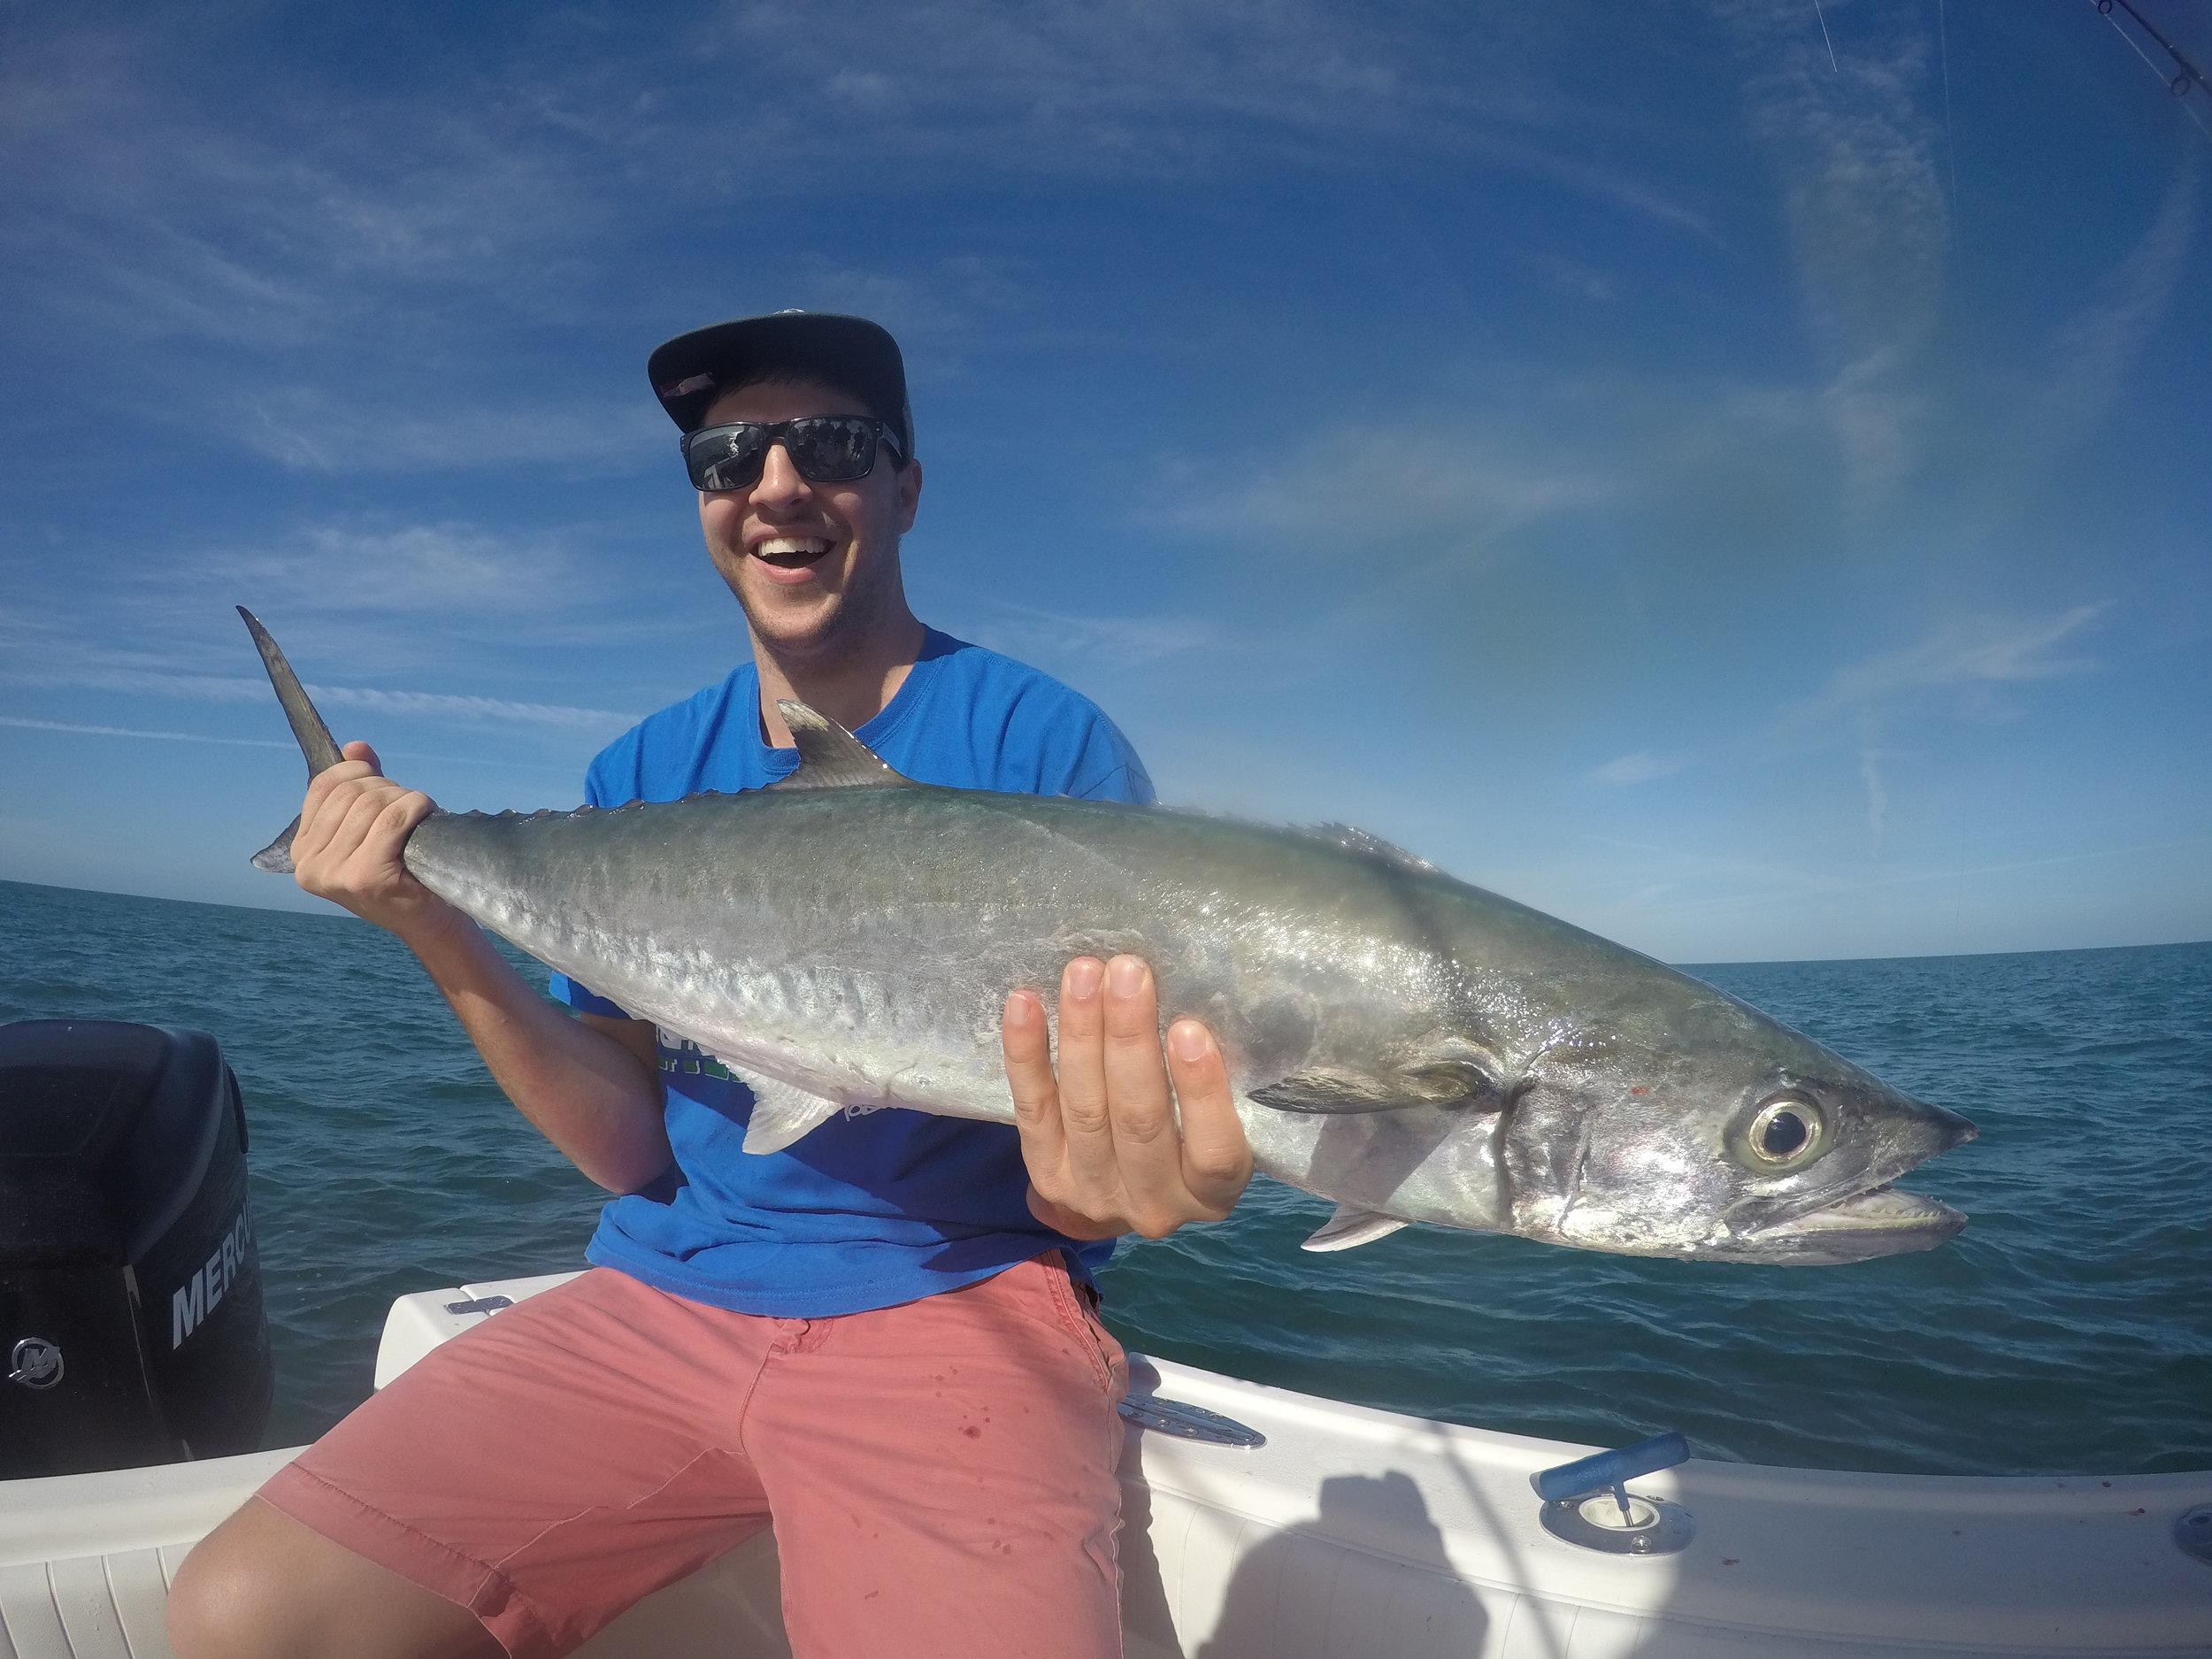 kingfish-Deep-Sea-Fishing-Charter-Offshore-Bonita-Springs-Nauti-Gal Fishing Adventures